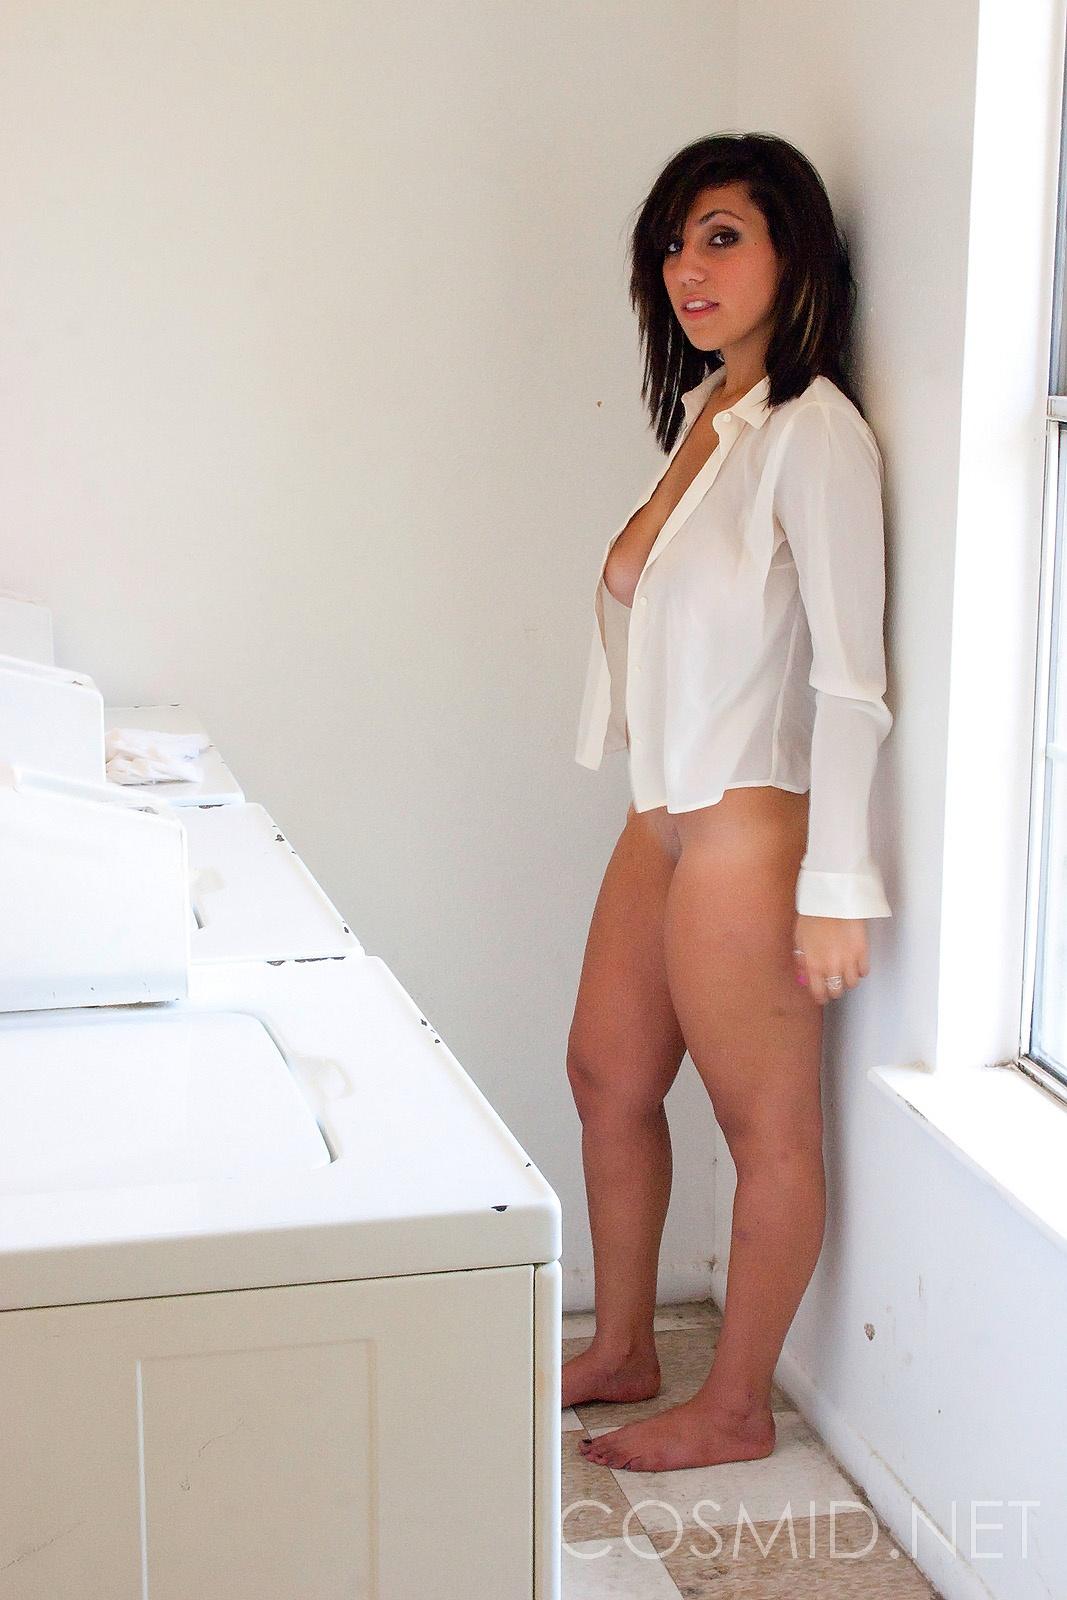 Hot sexy naked doing laundry right! good